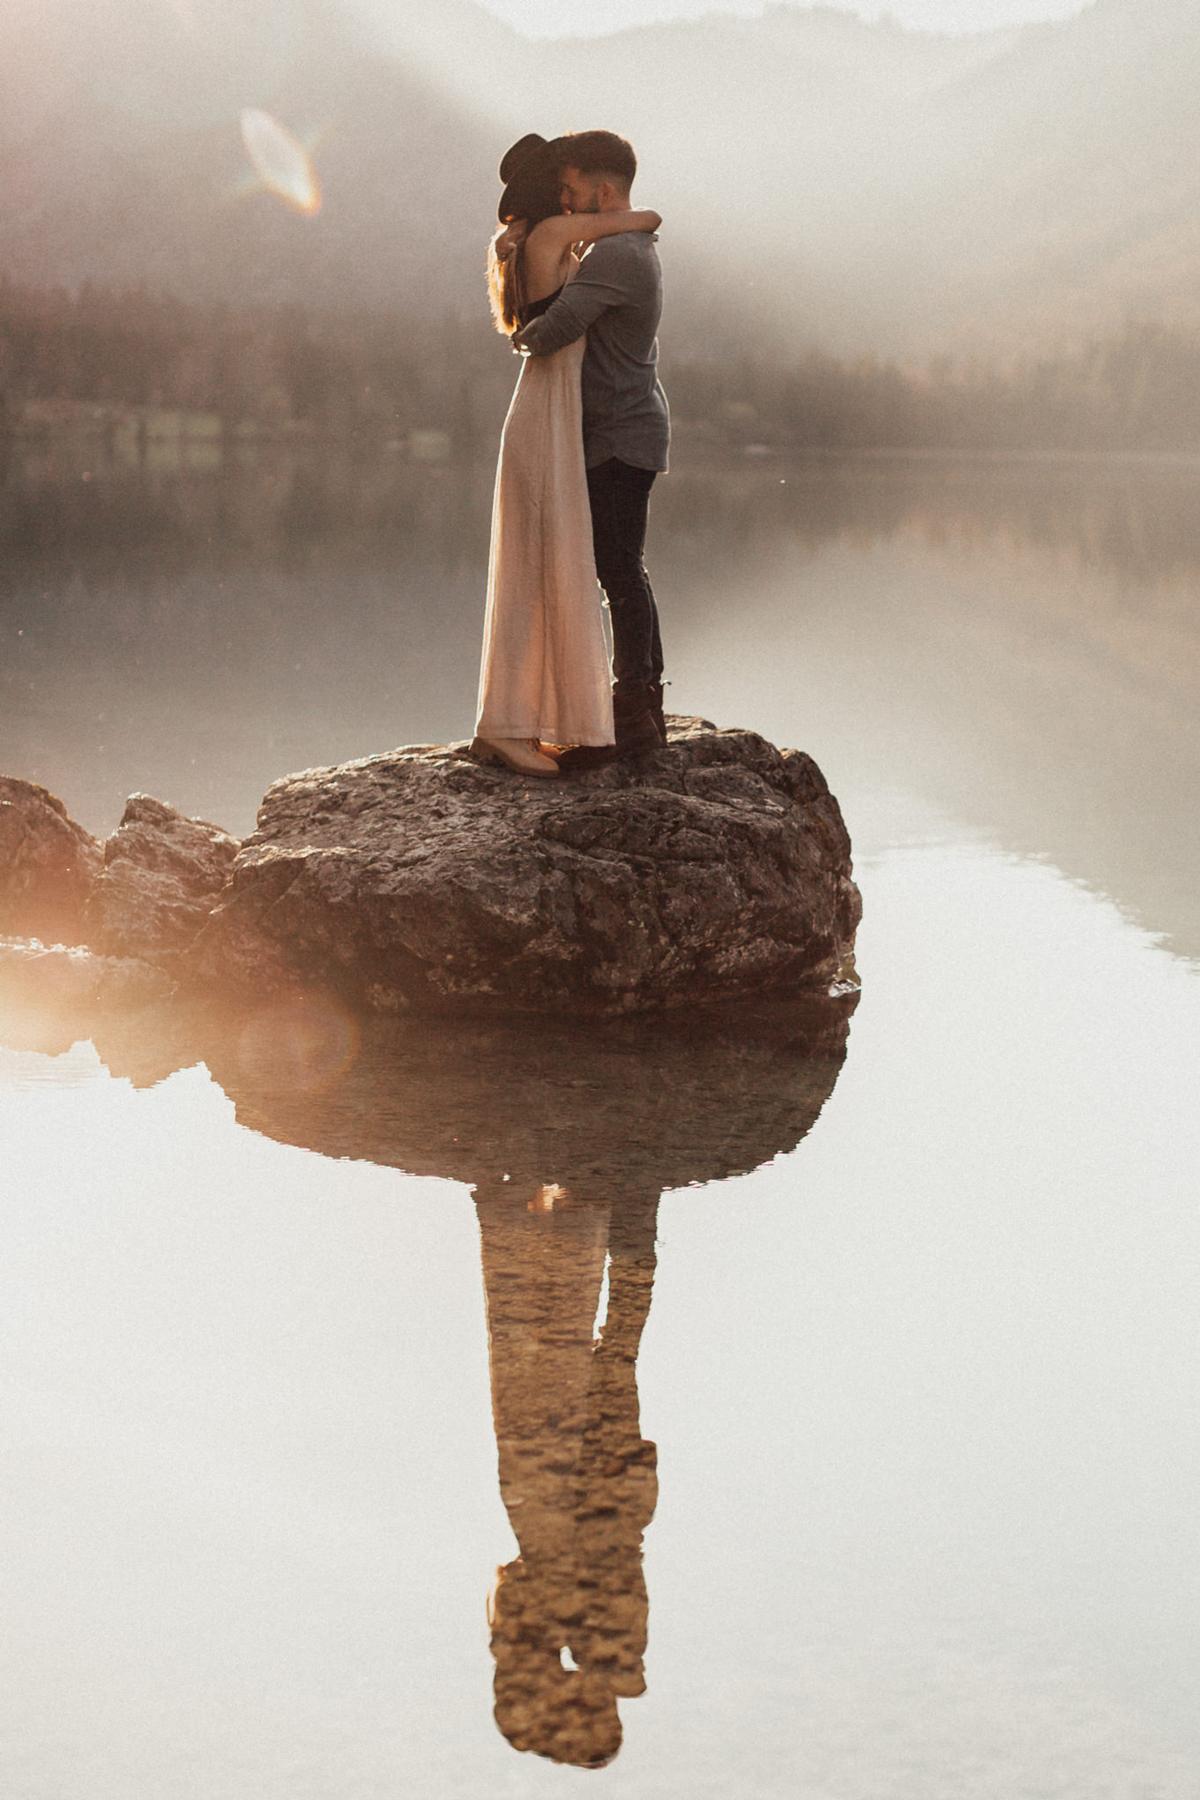 wedding-photographer-germany-melli-shayne-Things I wish I knew before I started a Photography Business - Lakeside-Couple-shoot-Mountains-Inspiration